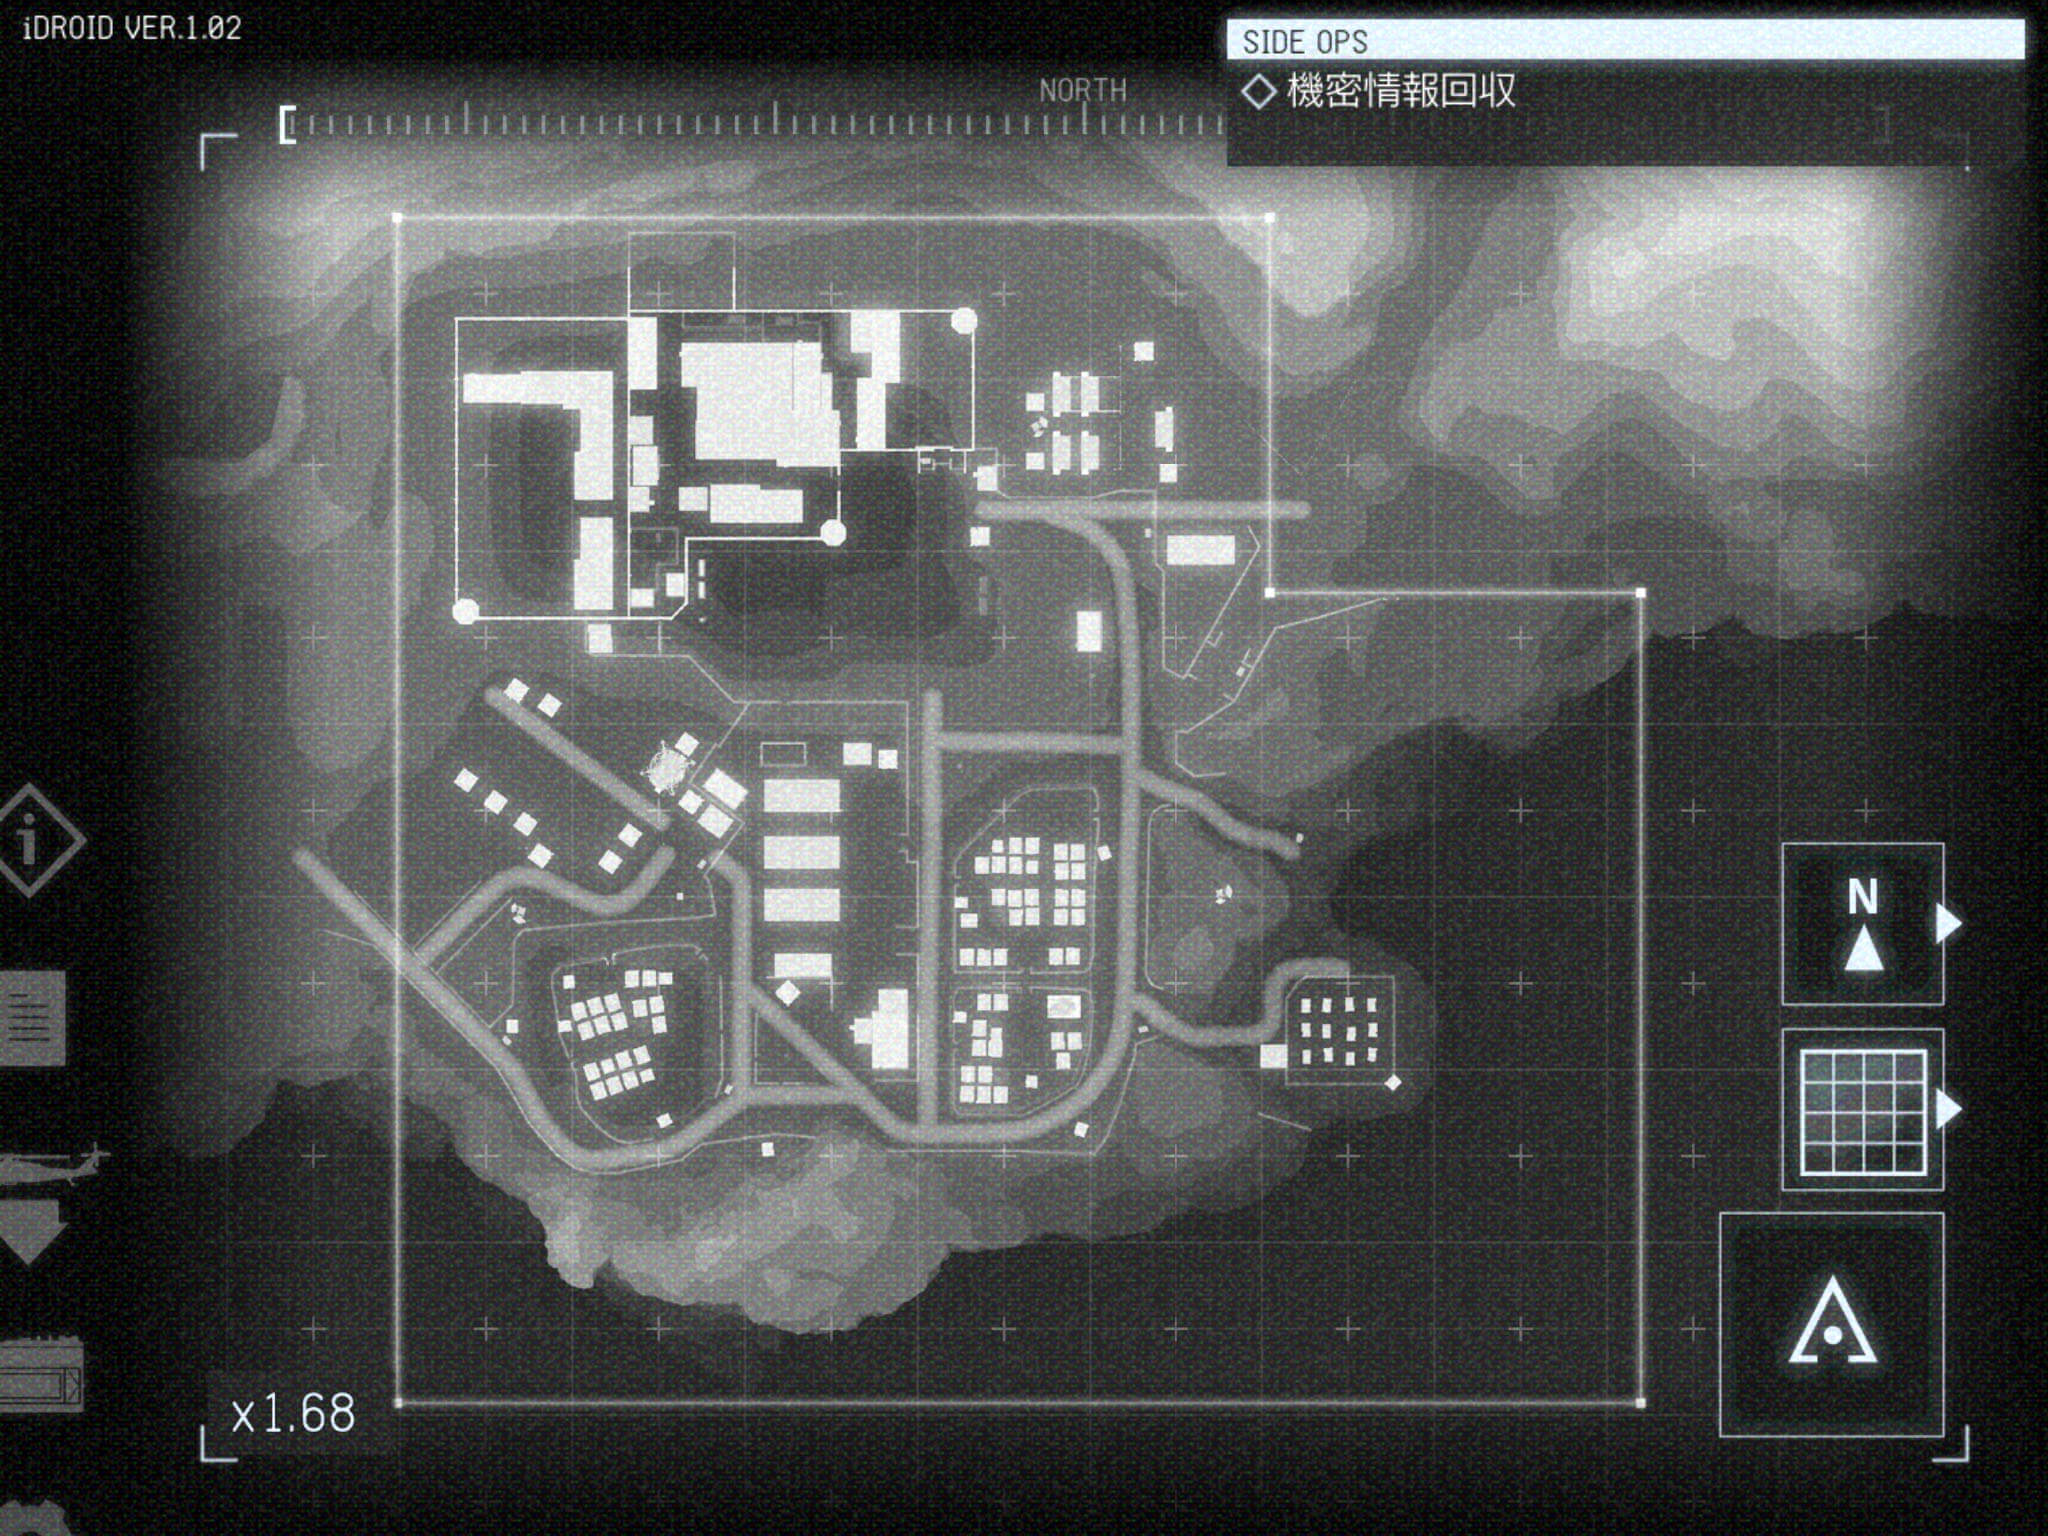 Metal Gear Solid V: Ground Zeroes Walkthrough - Page 1